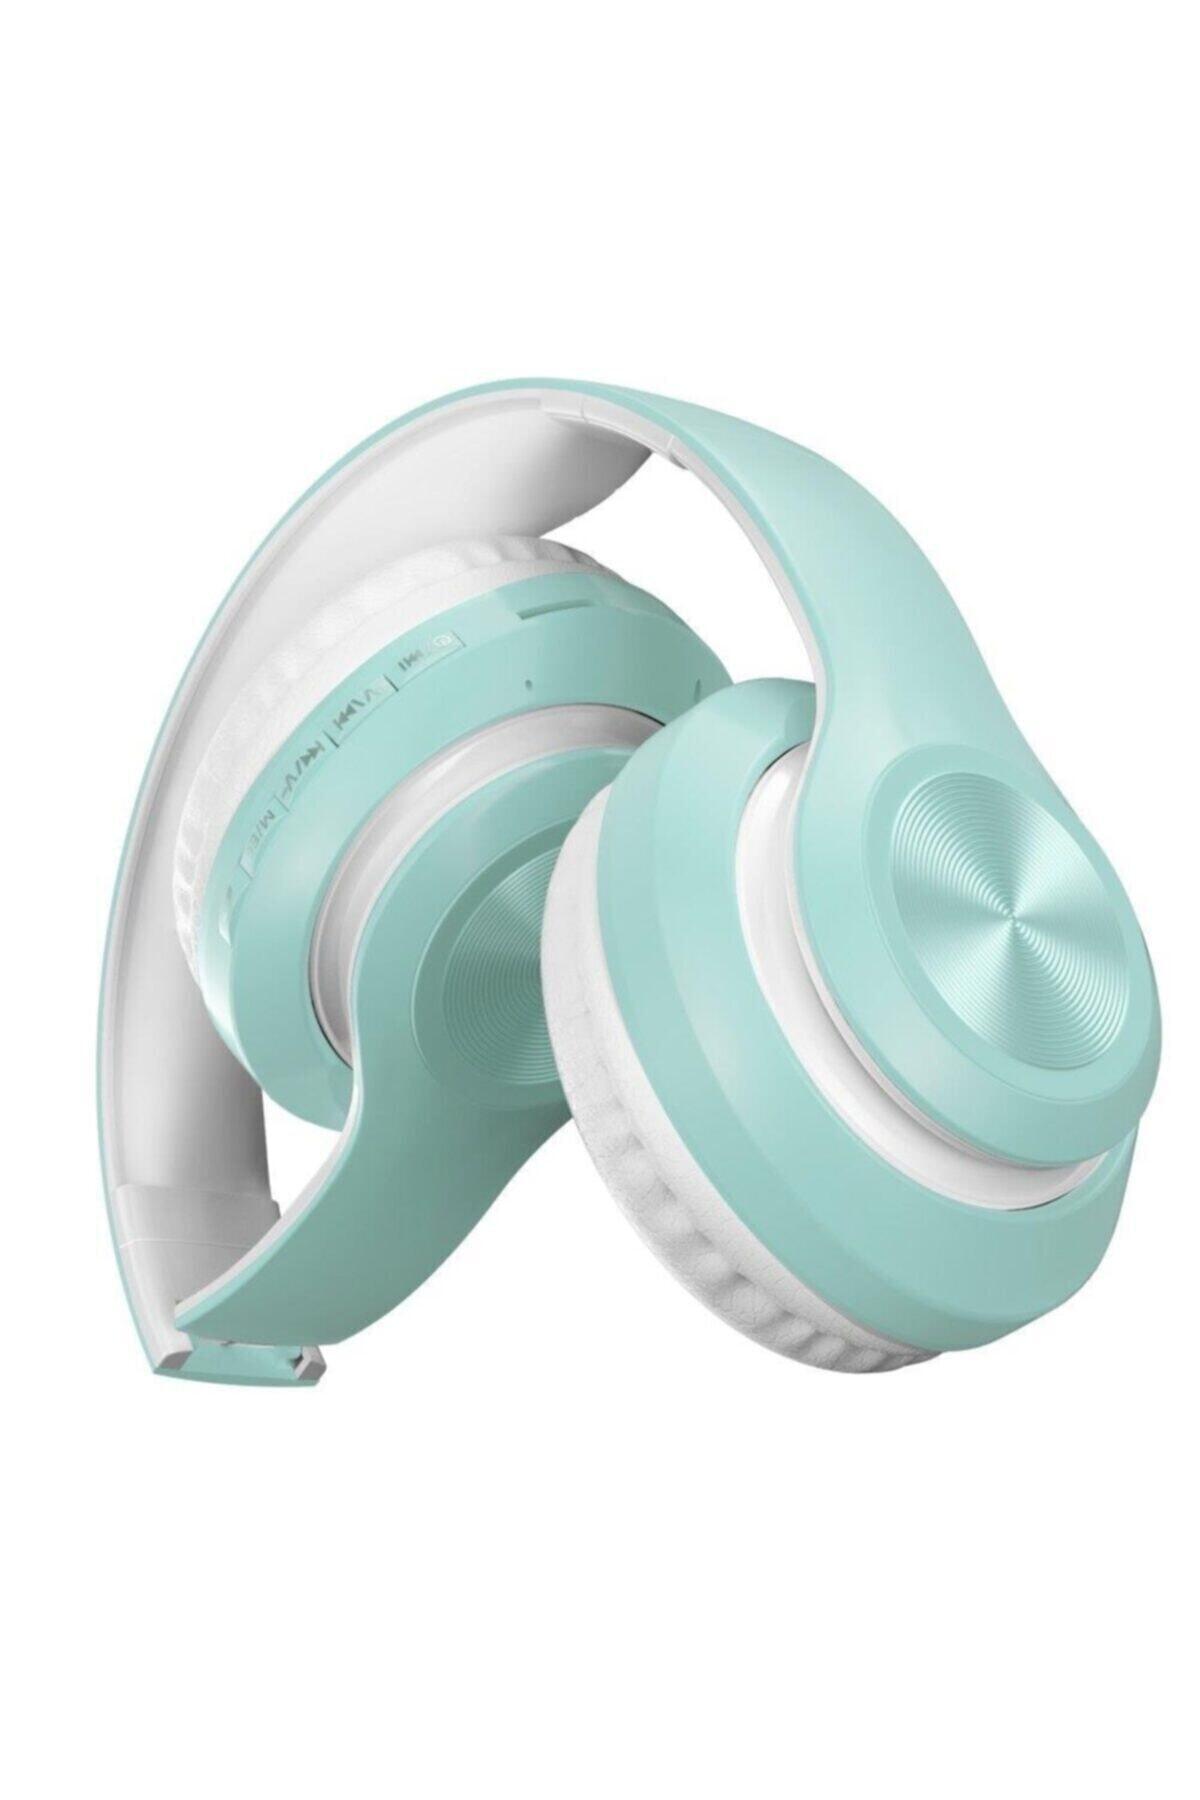 P68 Bluetooth Kablosuz Stereo Kulaklık - Turkuaz